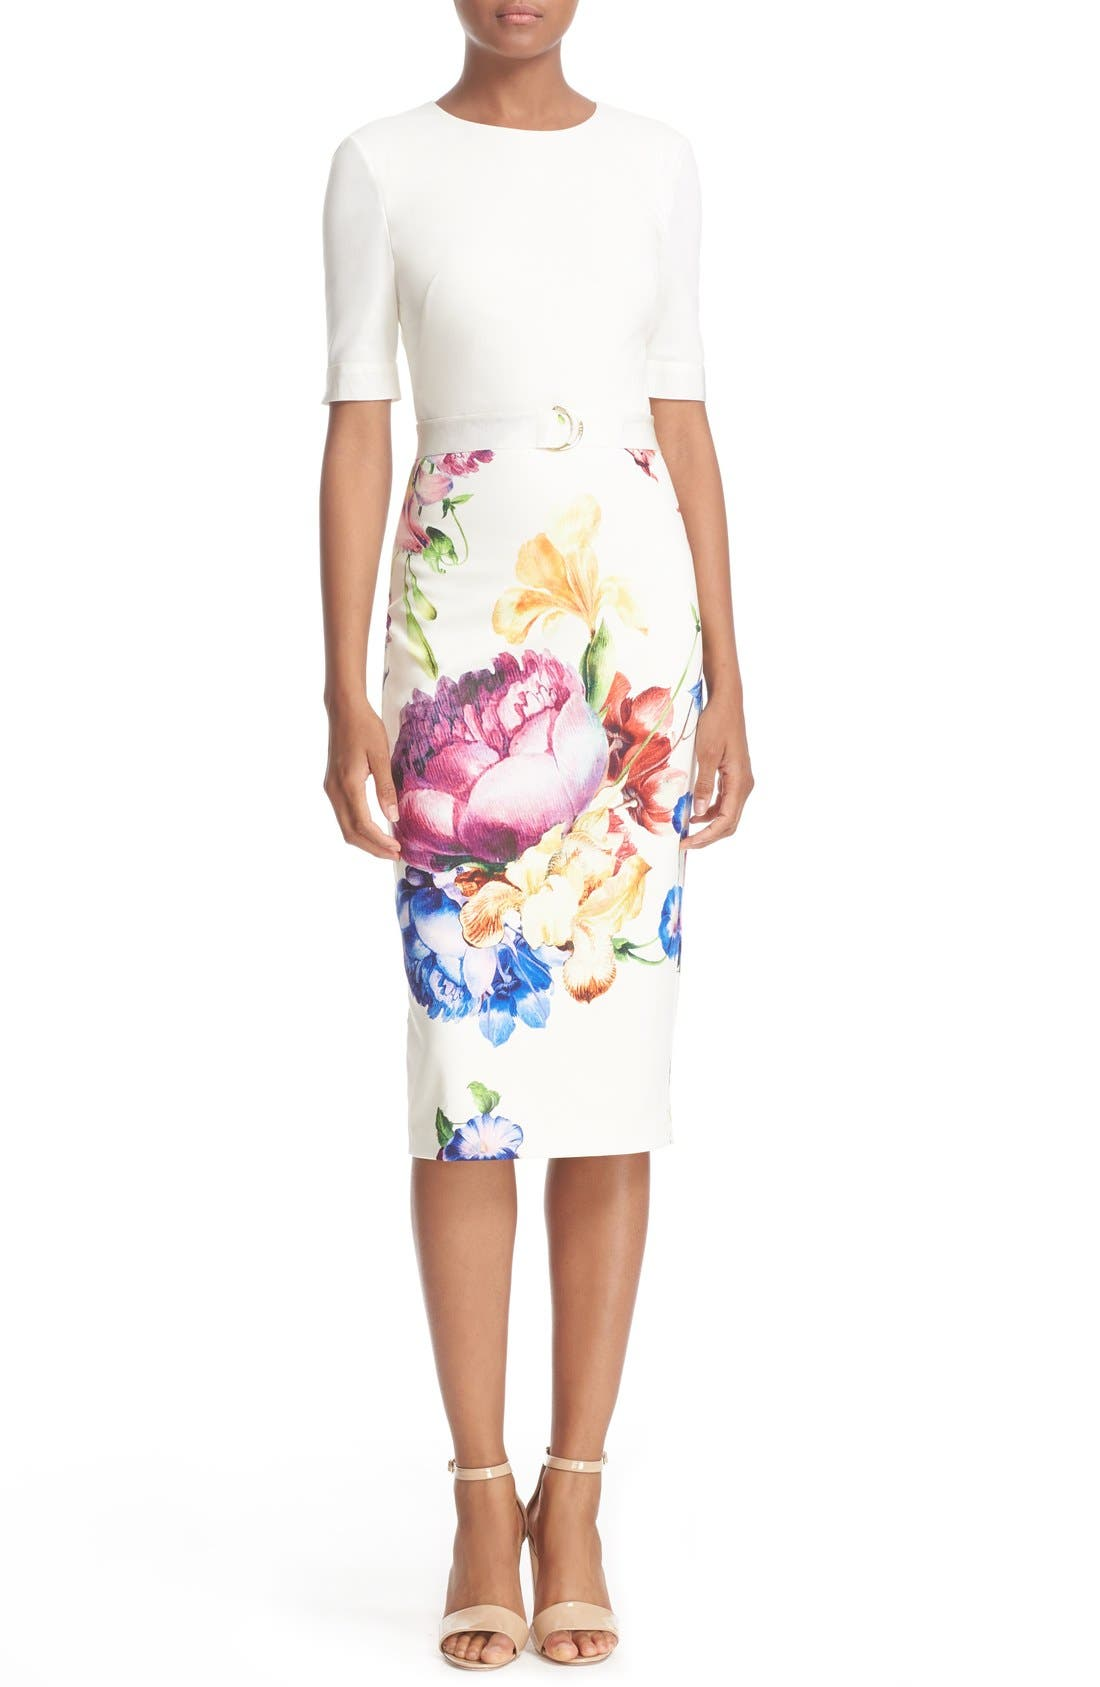 Alternate Image 1 Selected - Ted Baker London 'Tapestry Floral' Belted Print Midi Sheath Dress